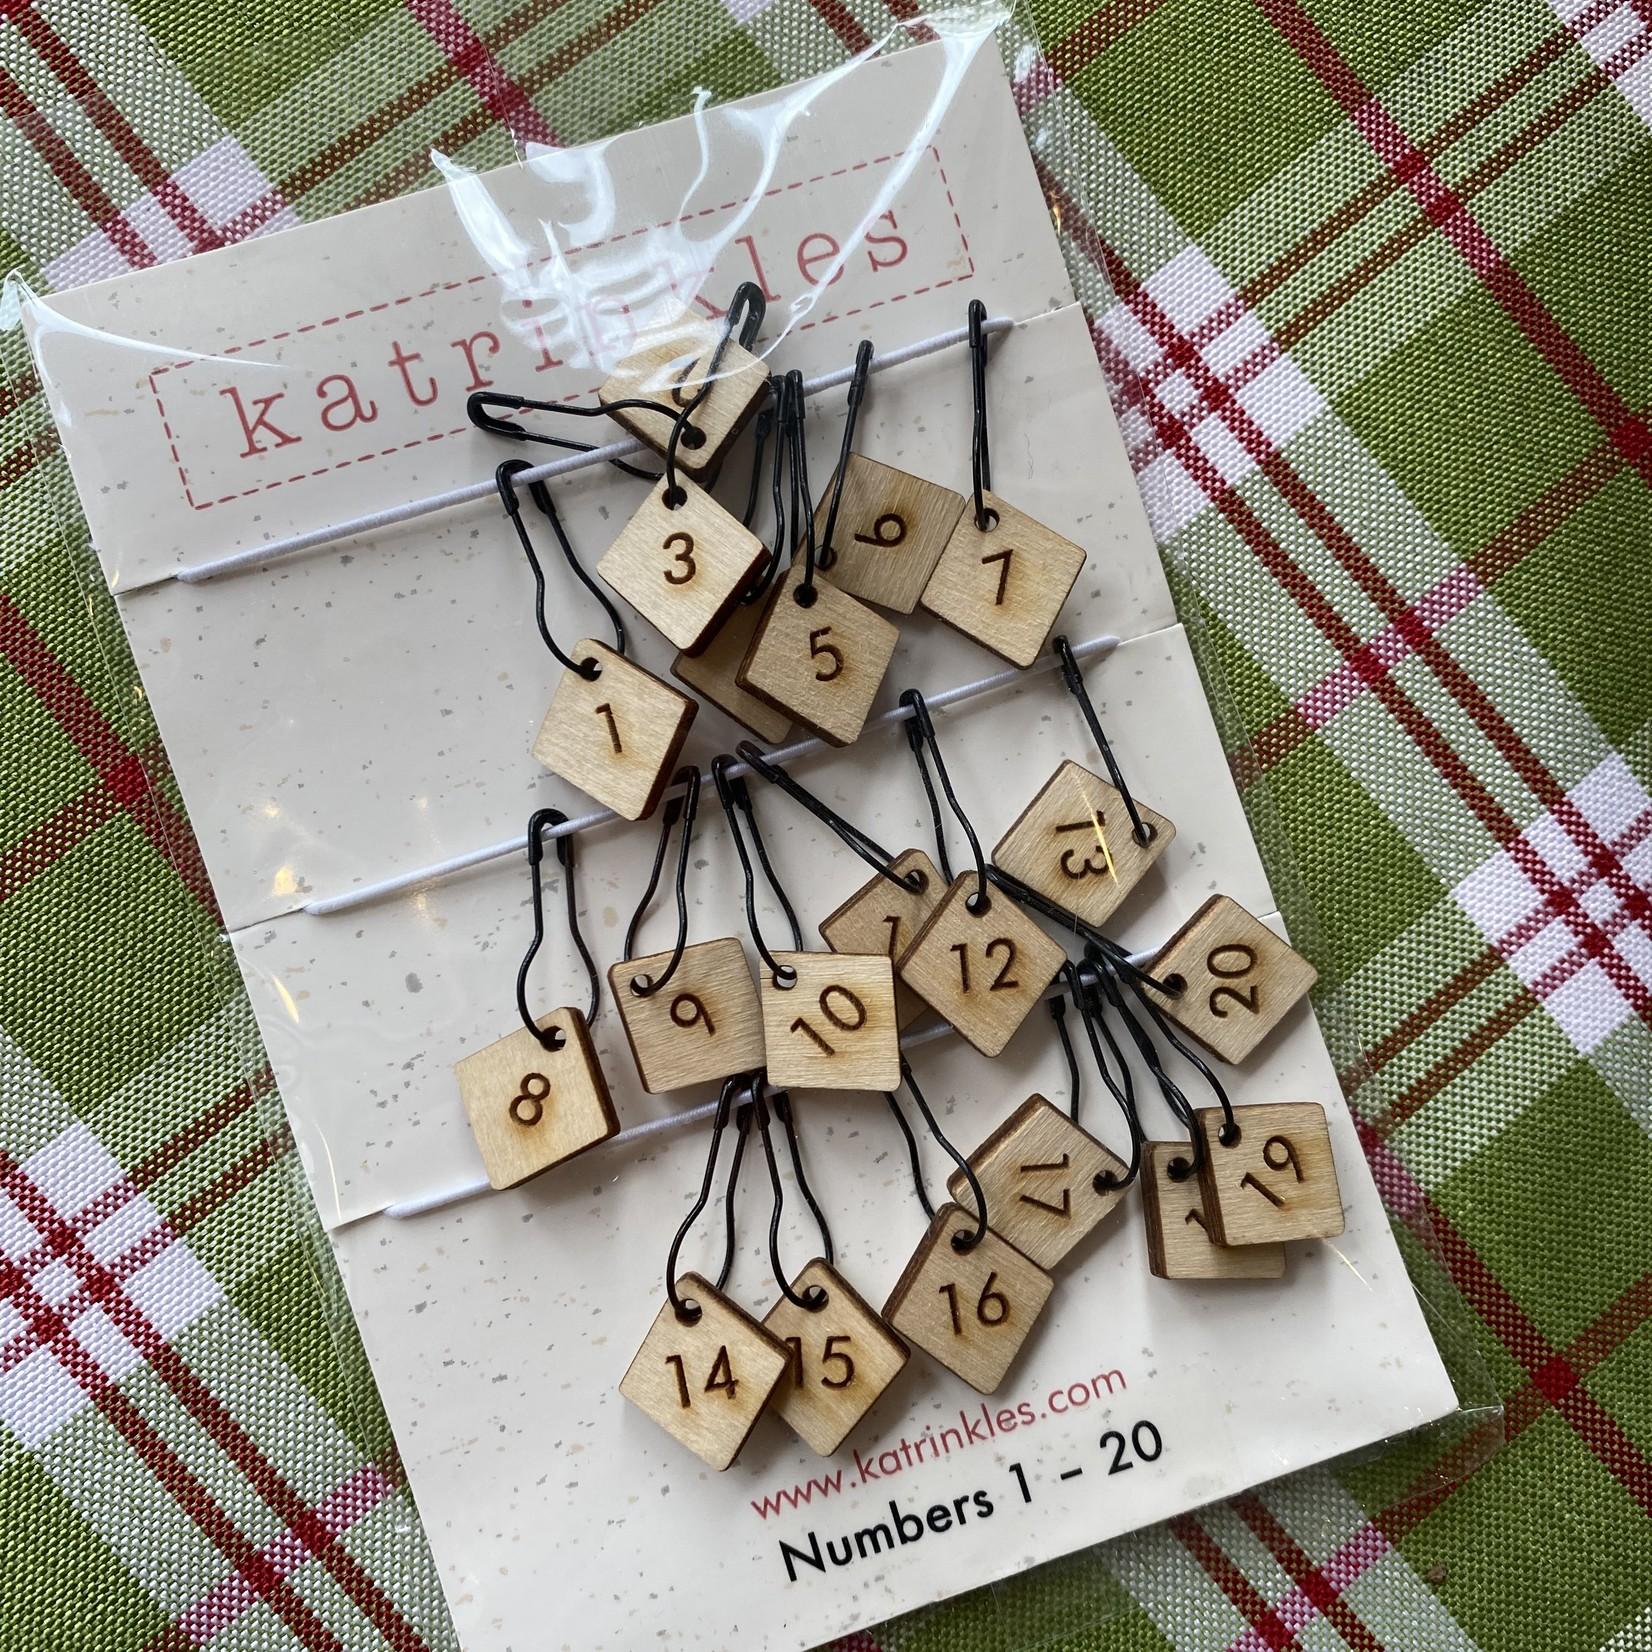 Katrinkles Katrinkles - Stitch Markers